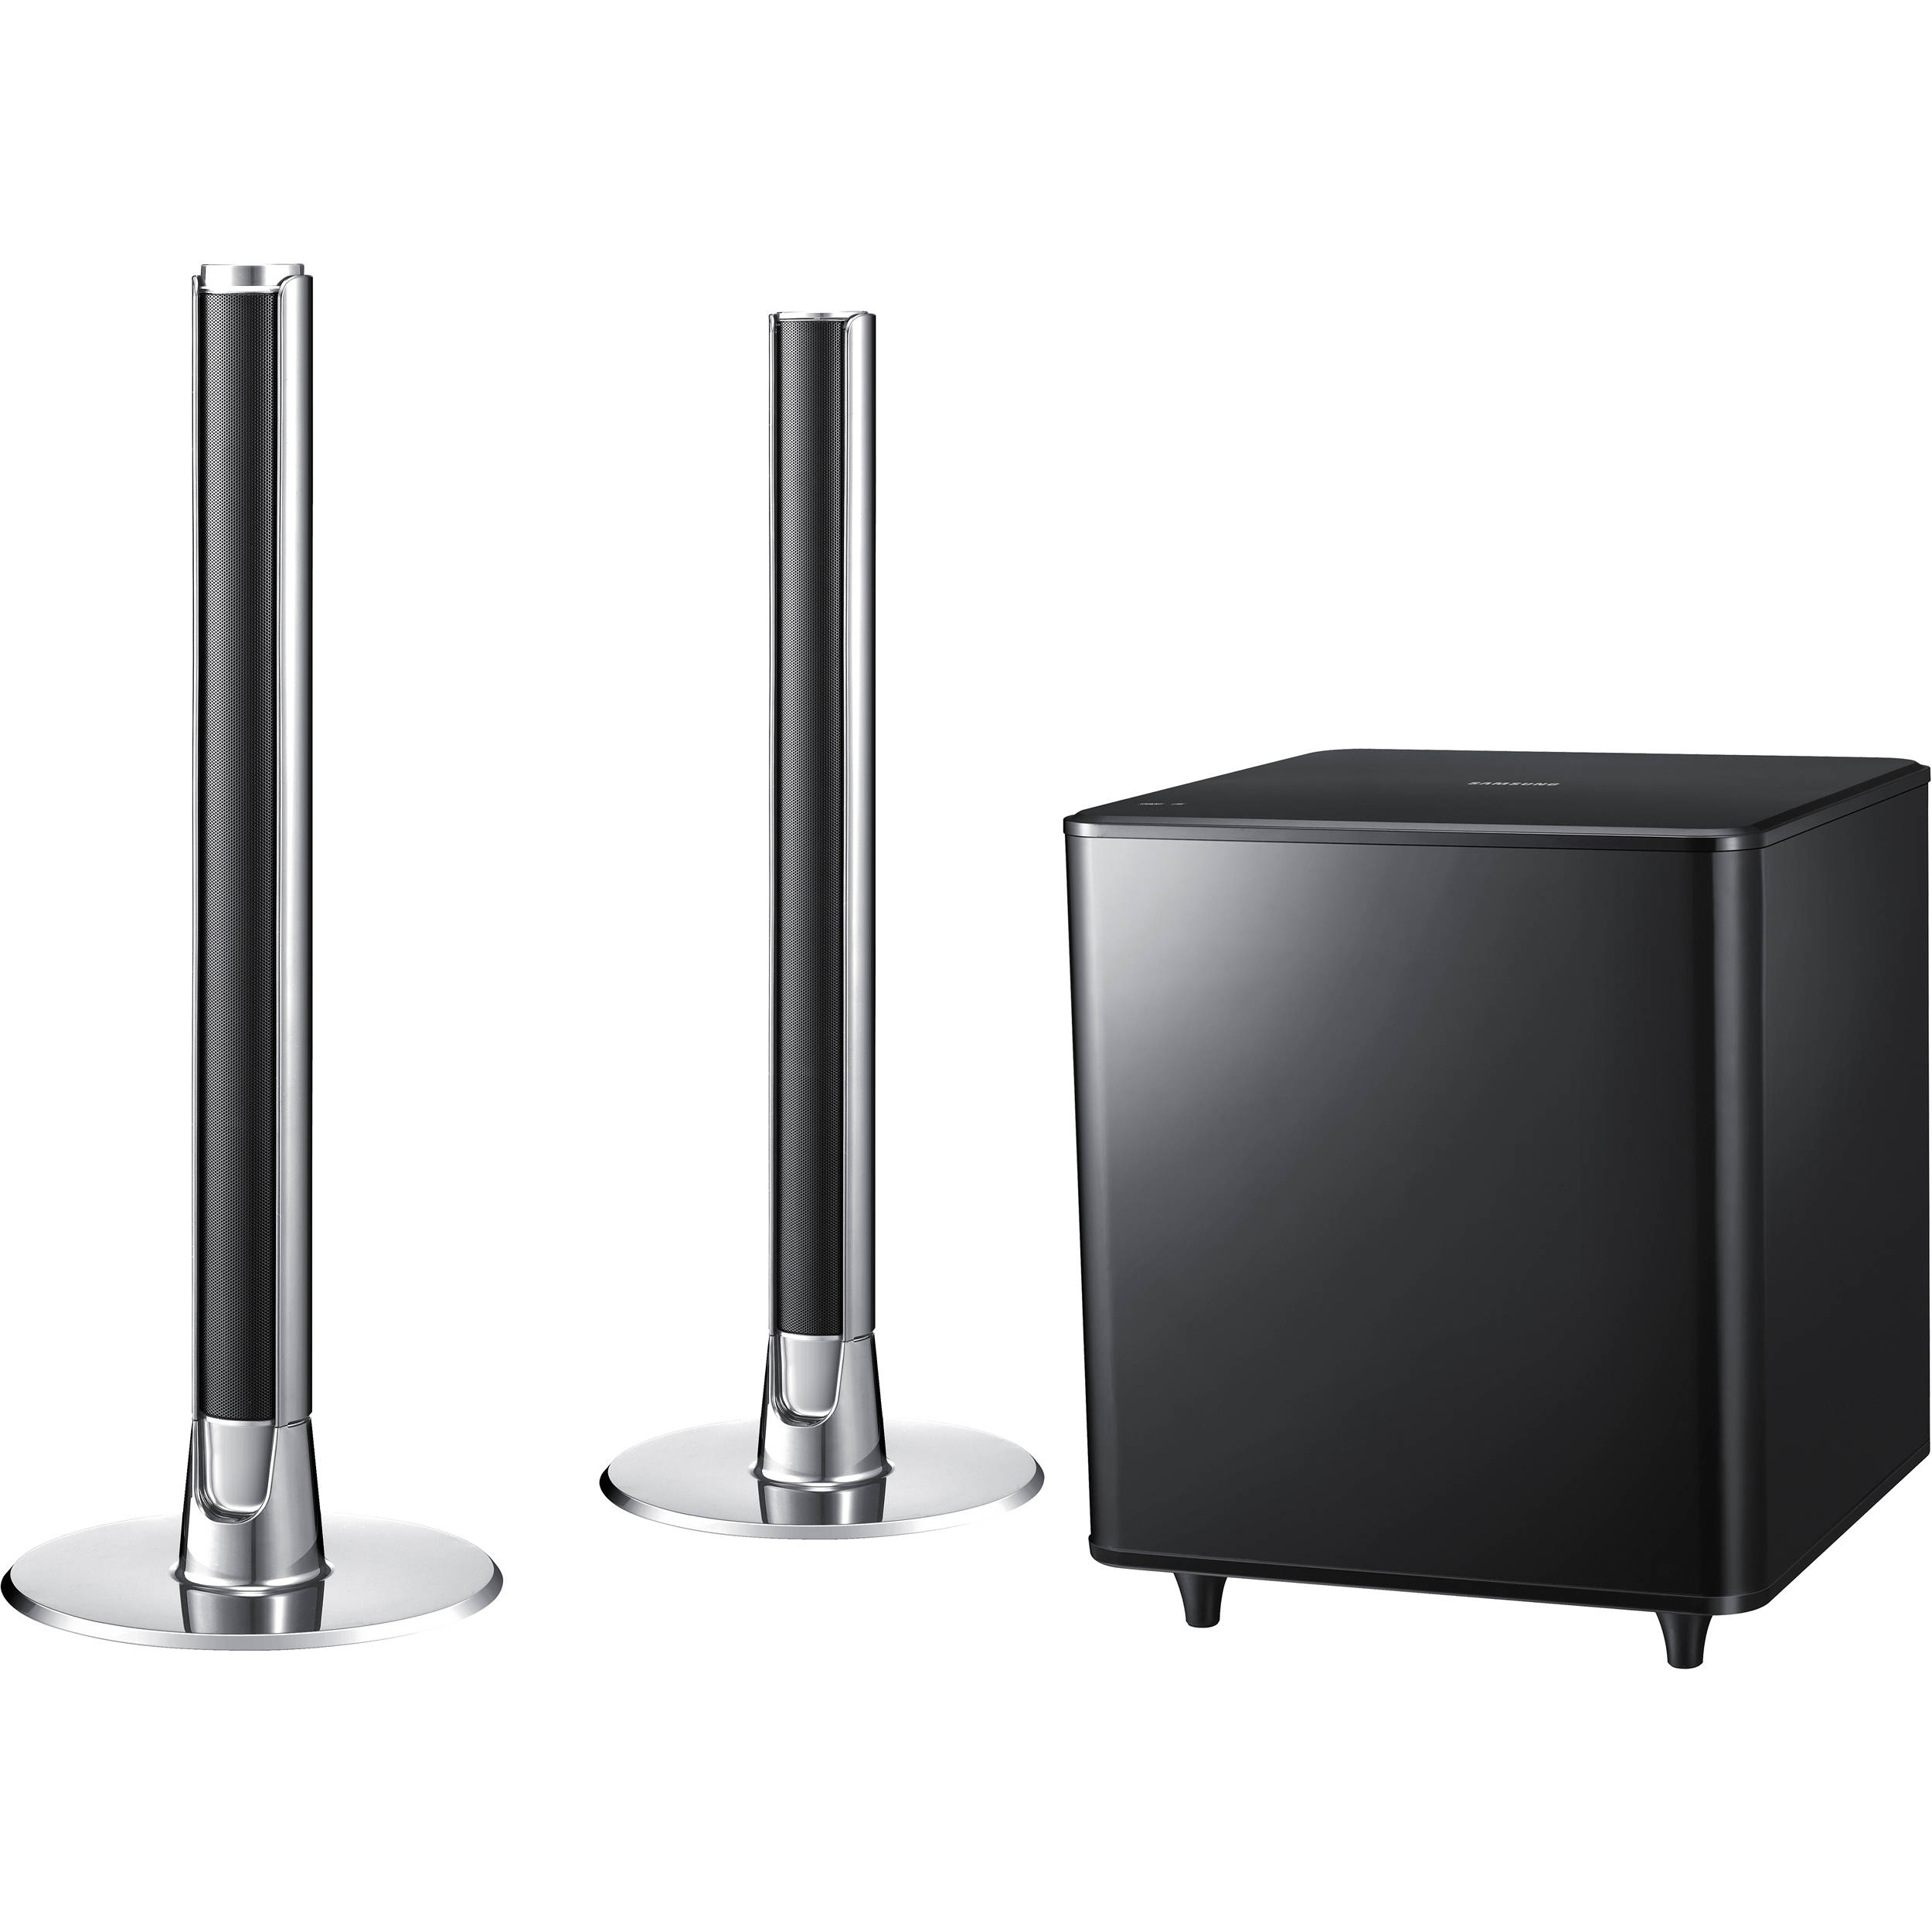 samsung hw e551 home theater speaker system hw e551 b h photo. Black Bedroom Furniture Sets. Home Design Ideas